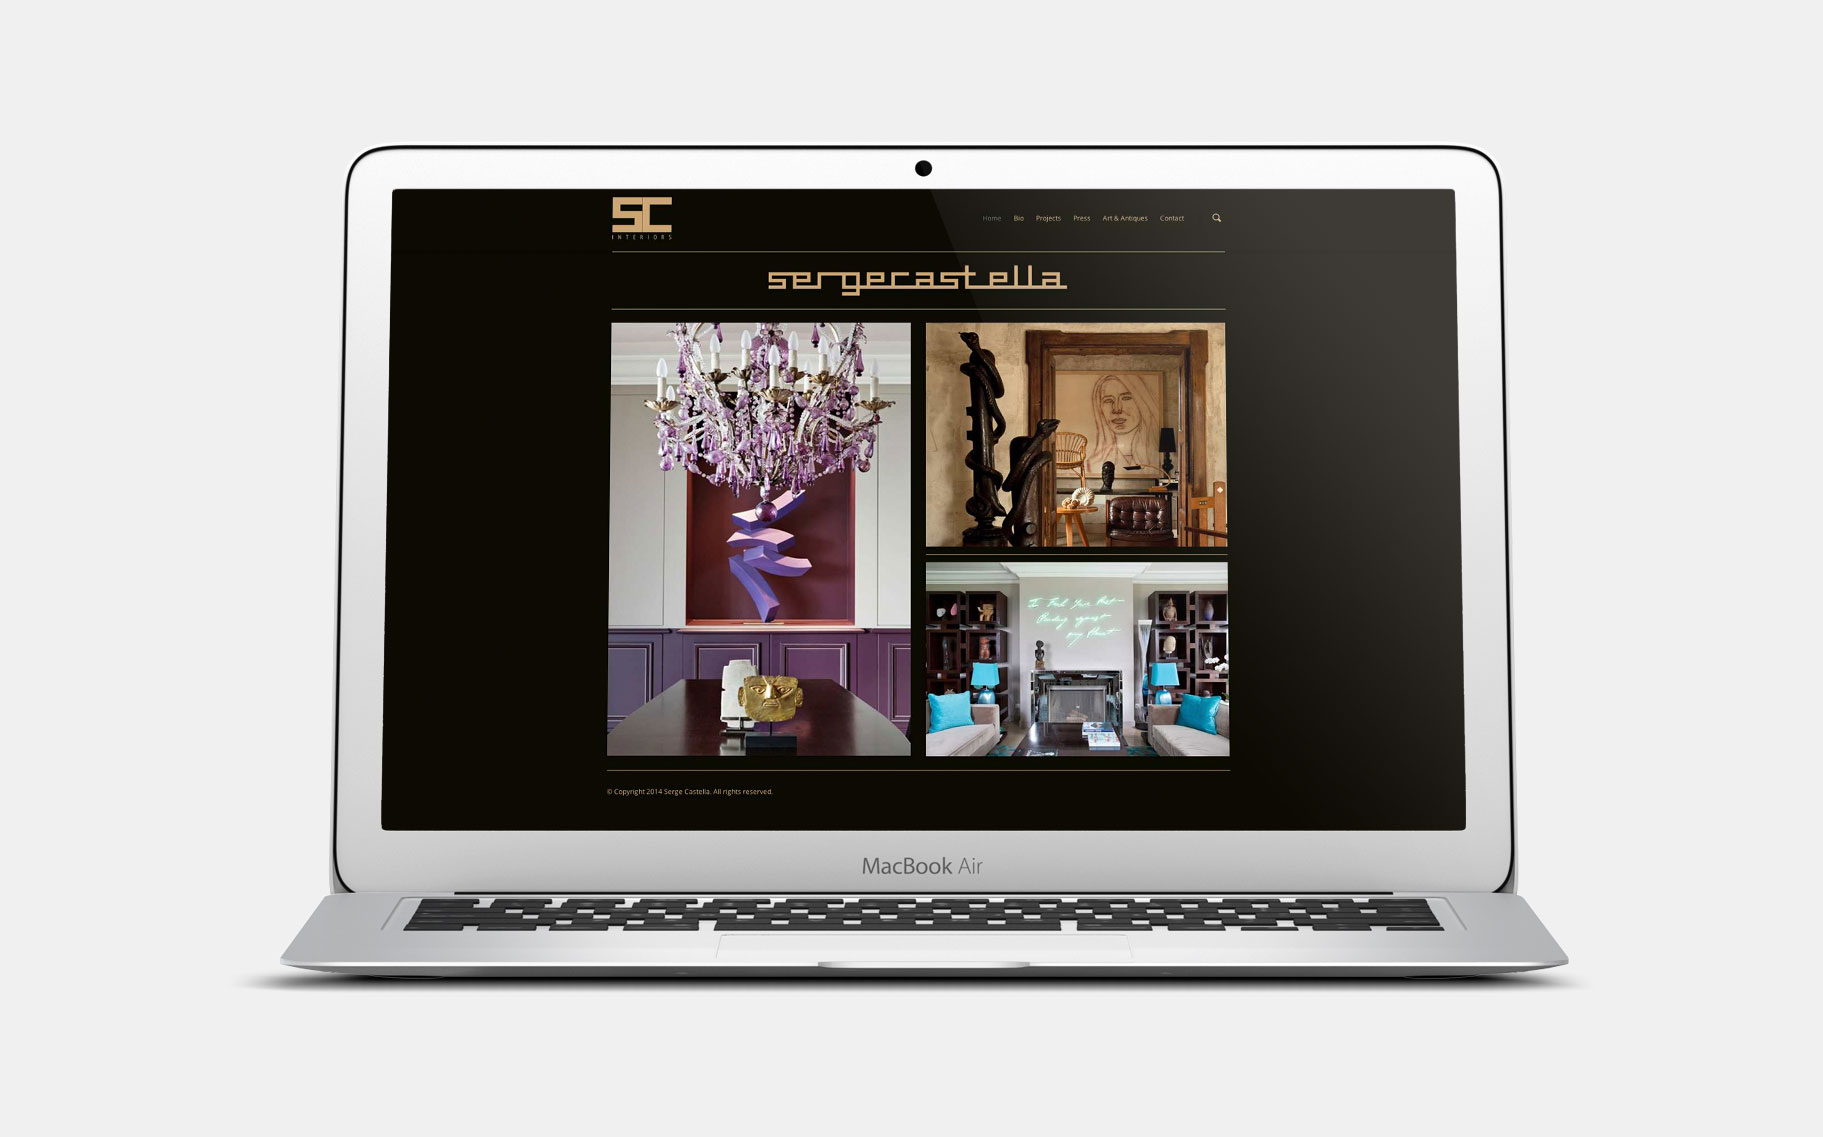 Serge-Castella-MacBook-iMac-Web-Disseny-Feat